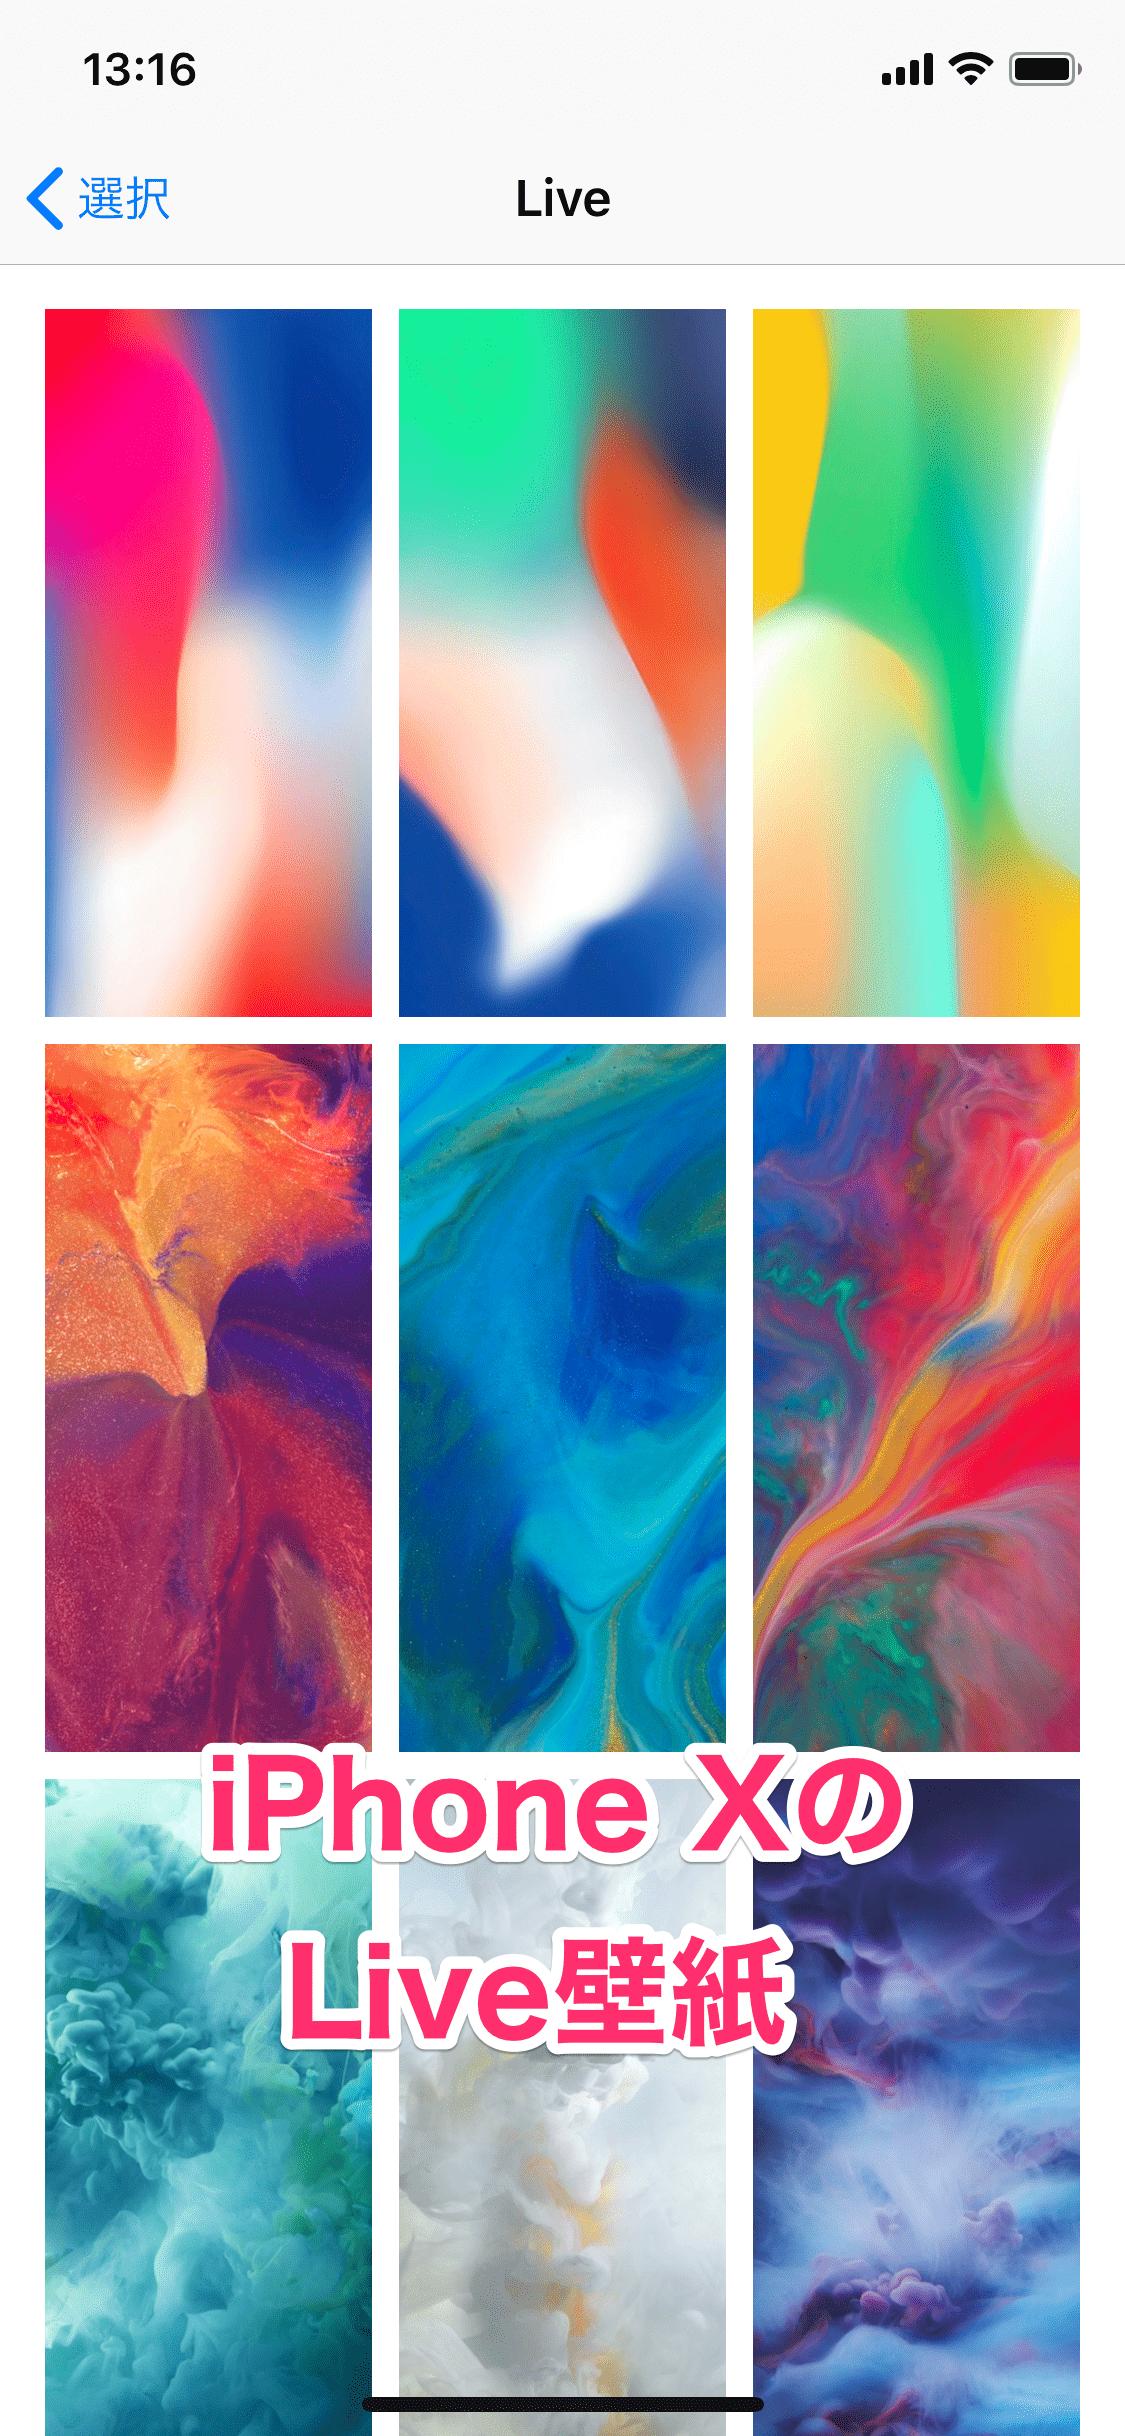 【iPhone XS】新しい壁紙はどんな感じ? 動くロック画面(Live壁紙)を動画で見る